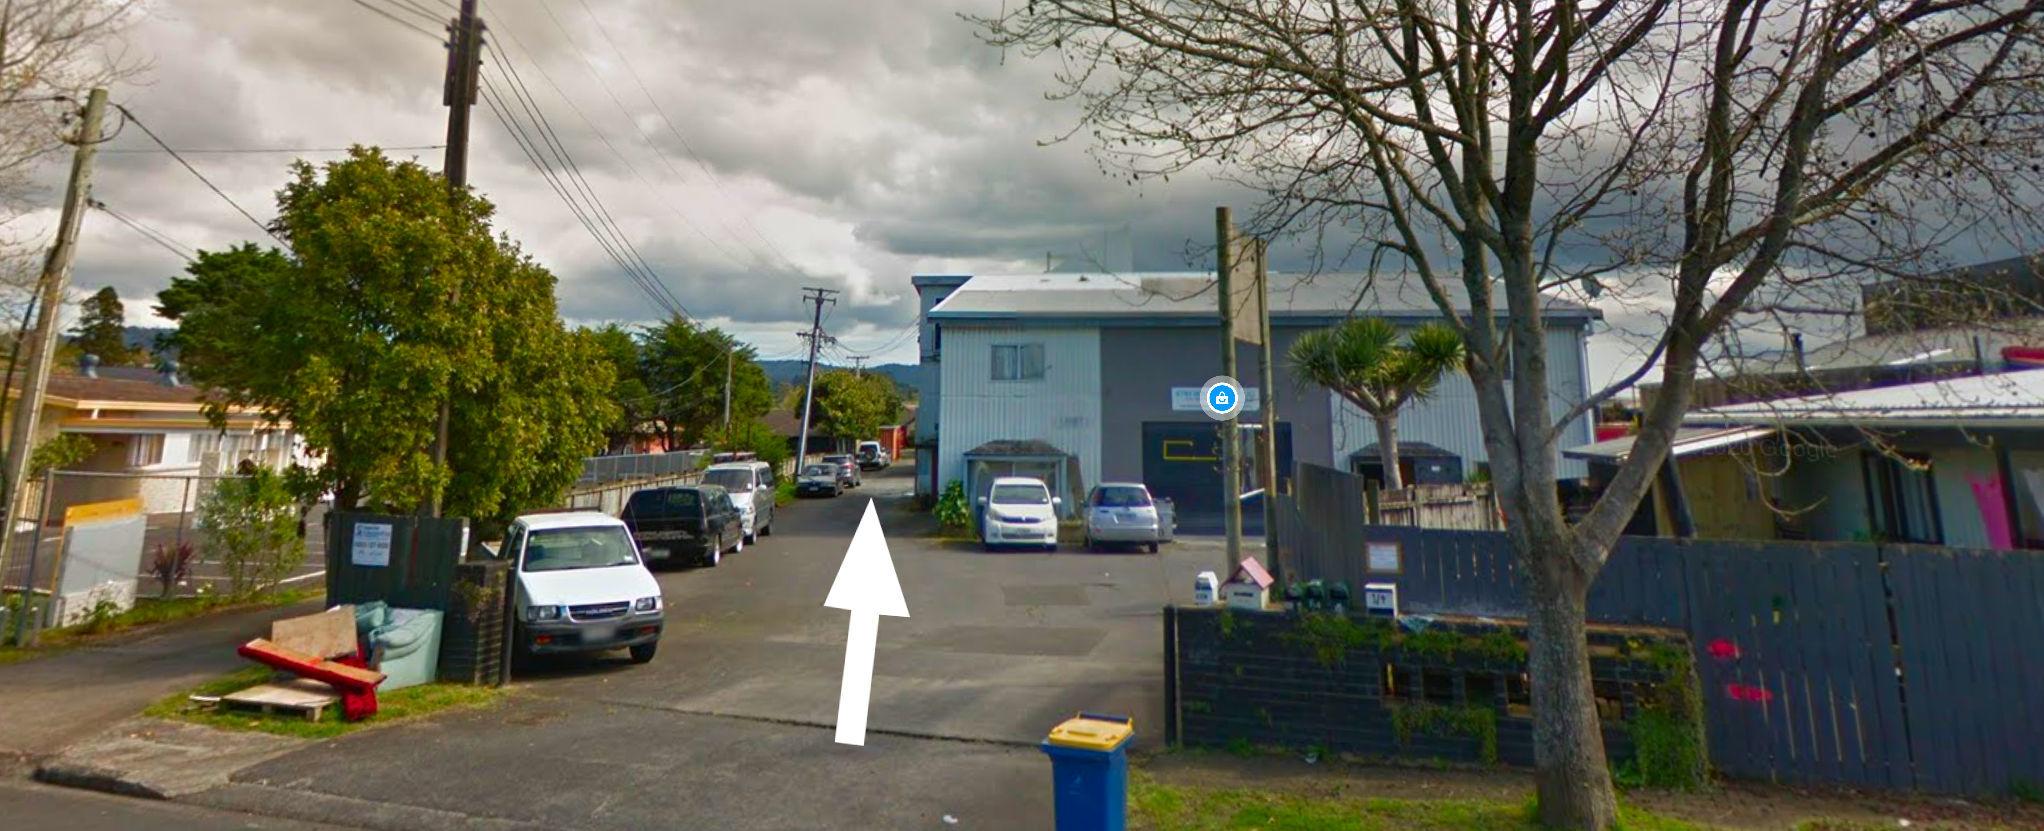 4 Waikaukau streetview